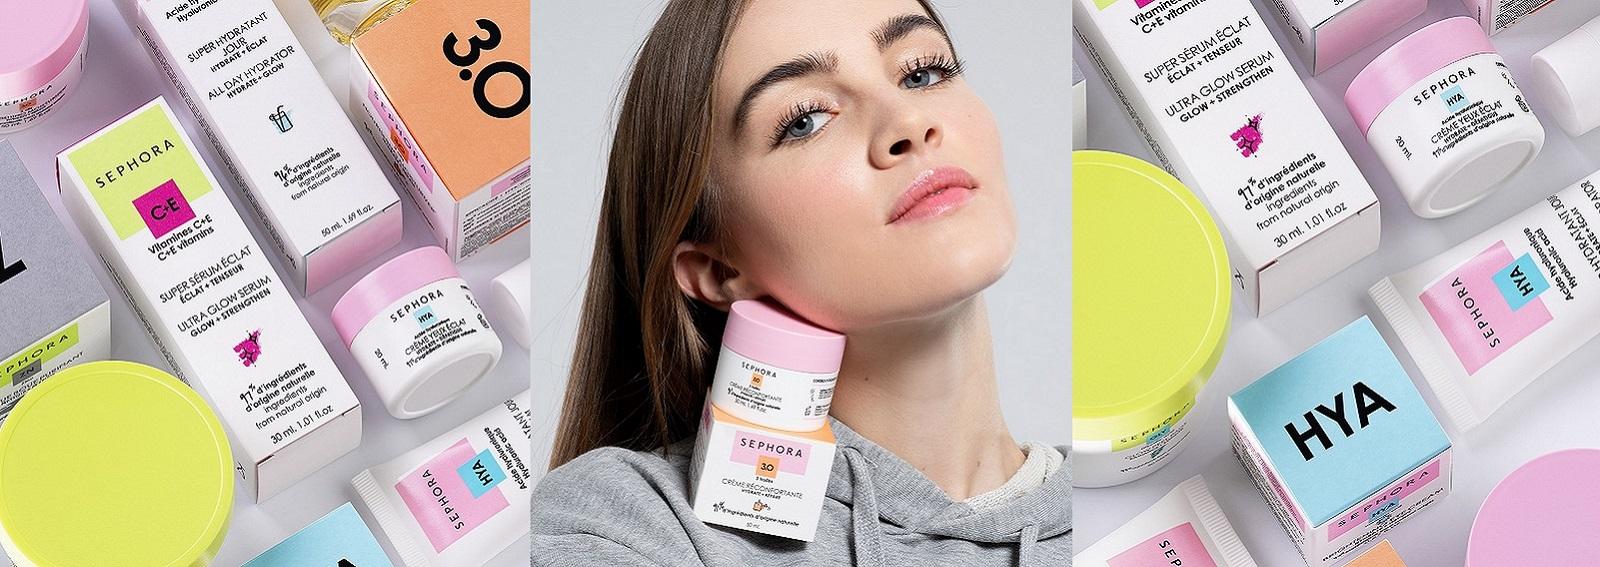 cover-sephora-good-for-skin-all-you-prodotti-desktop